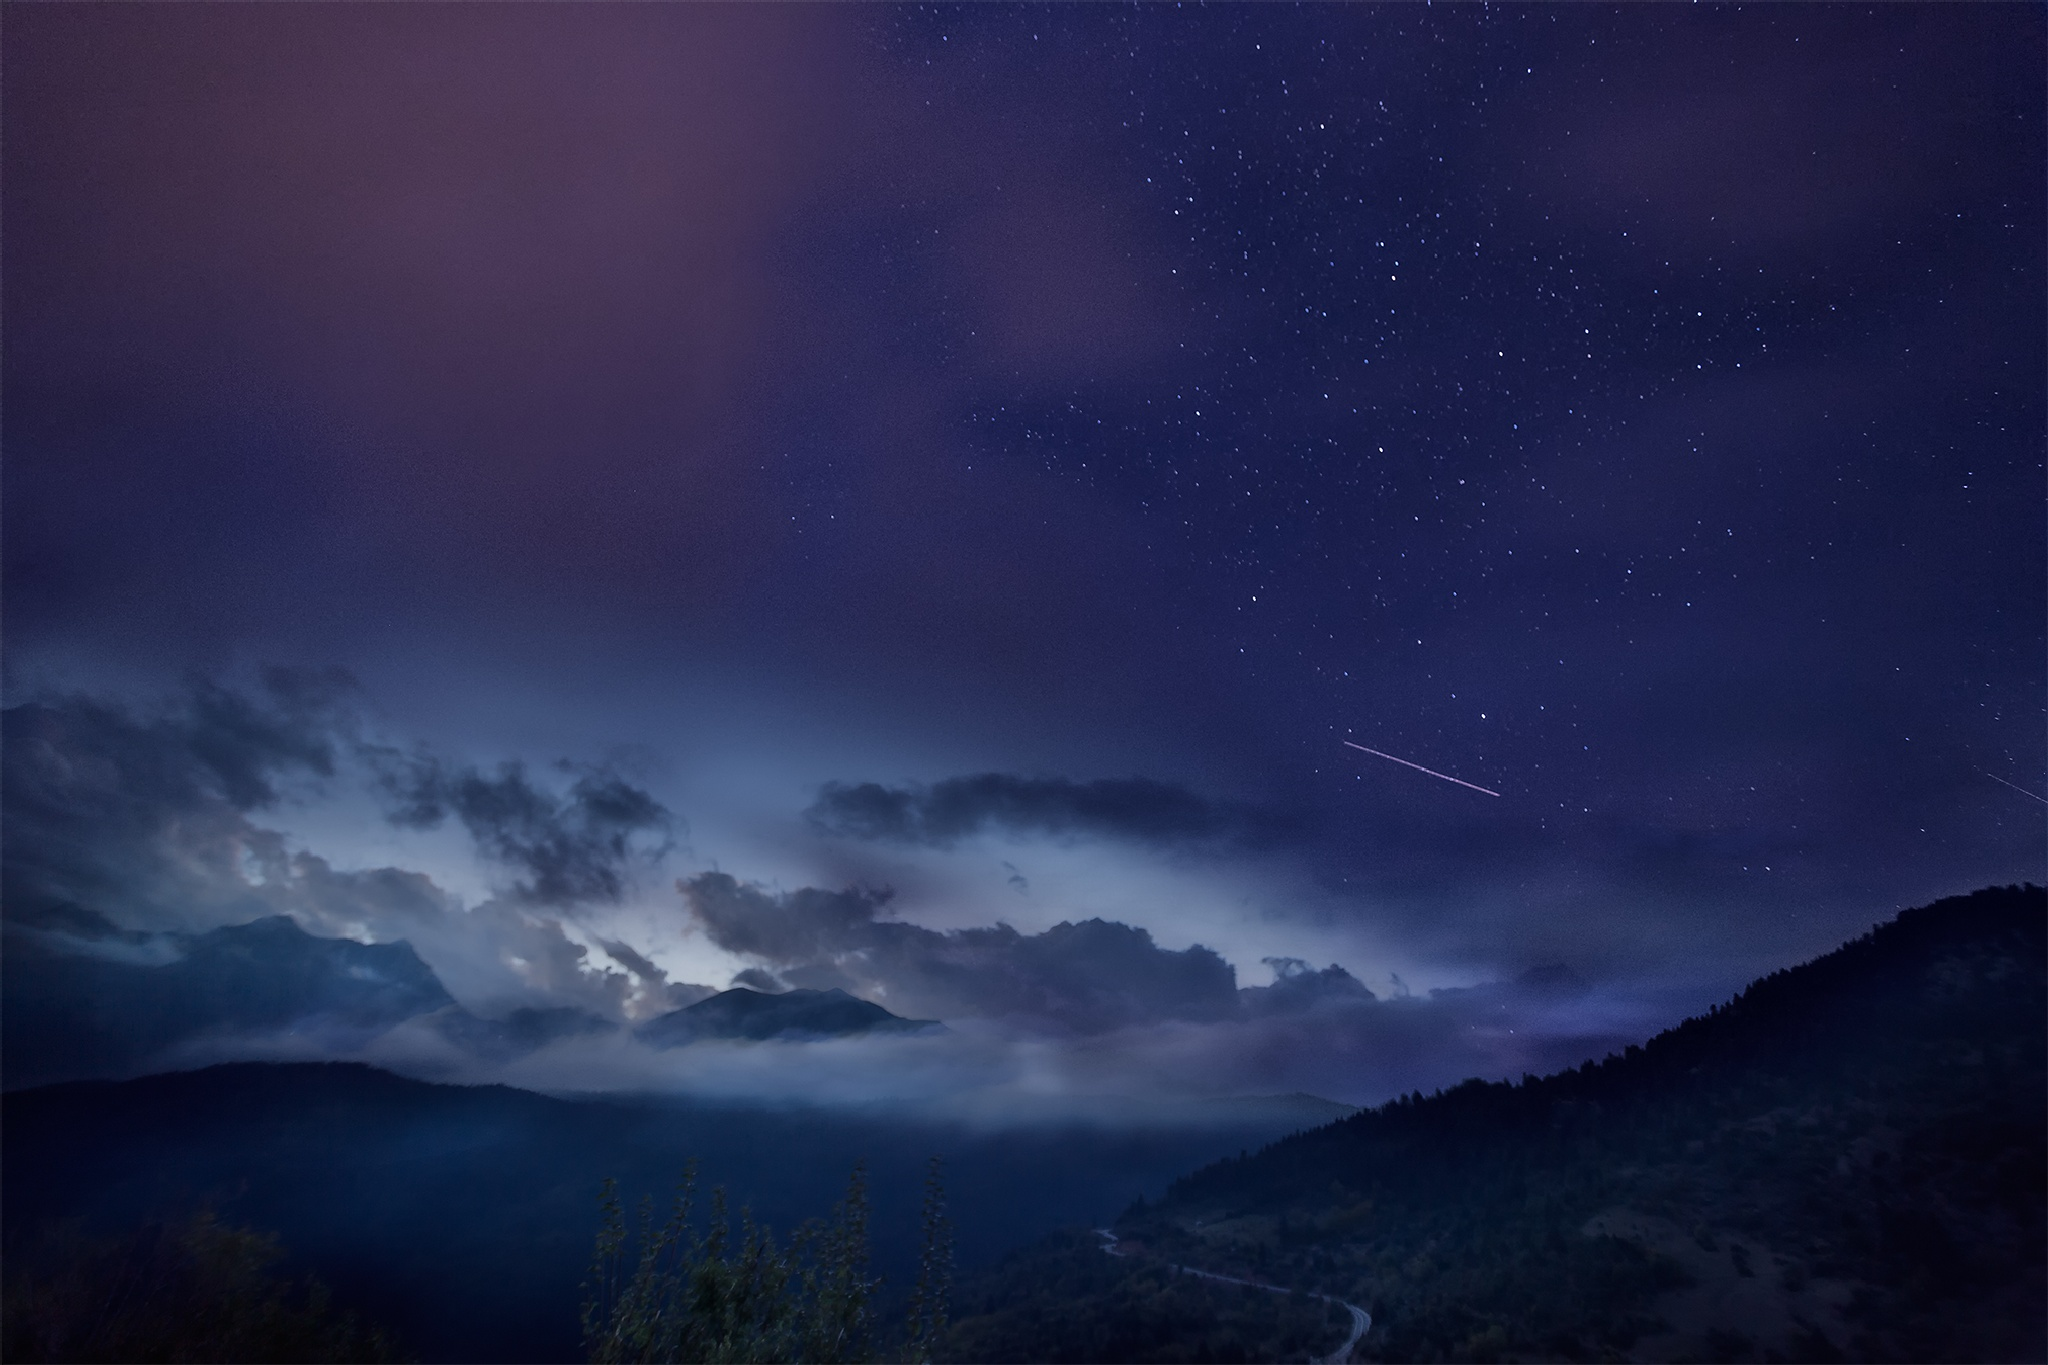 Falling Star by iliasagiostratitis